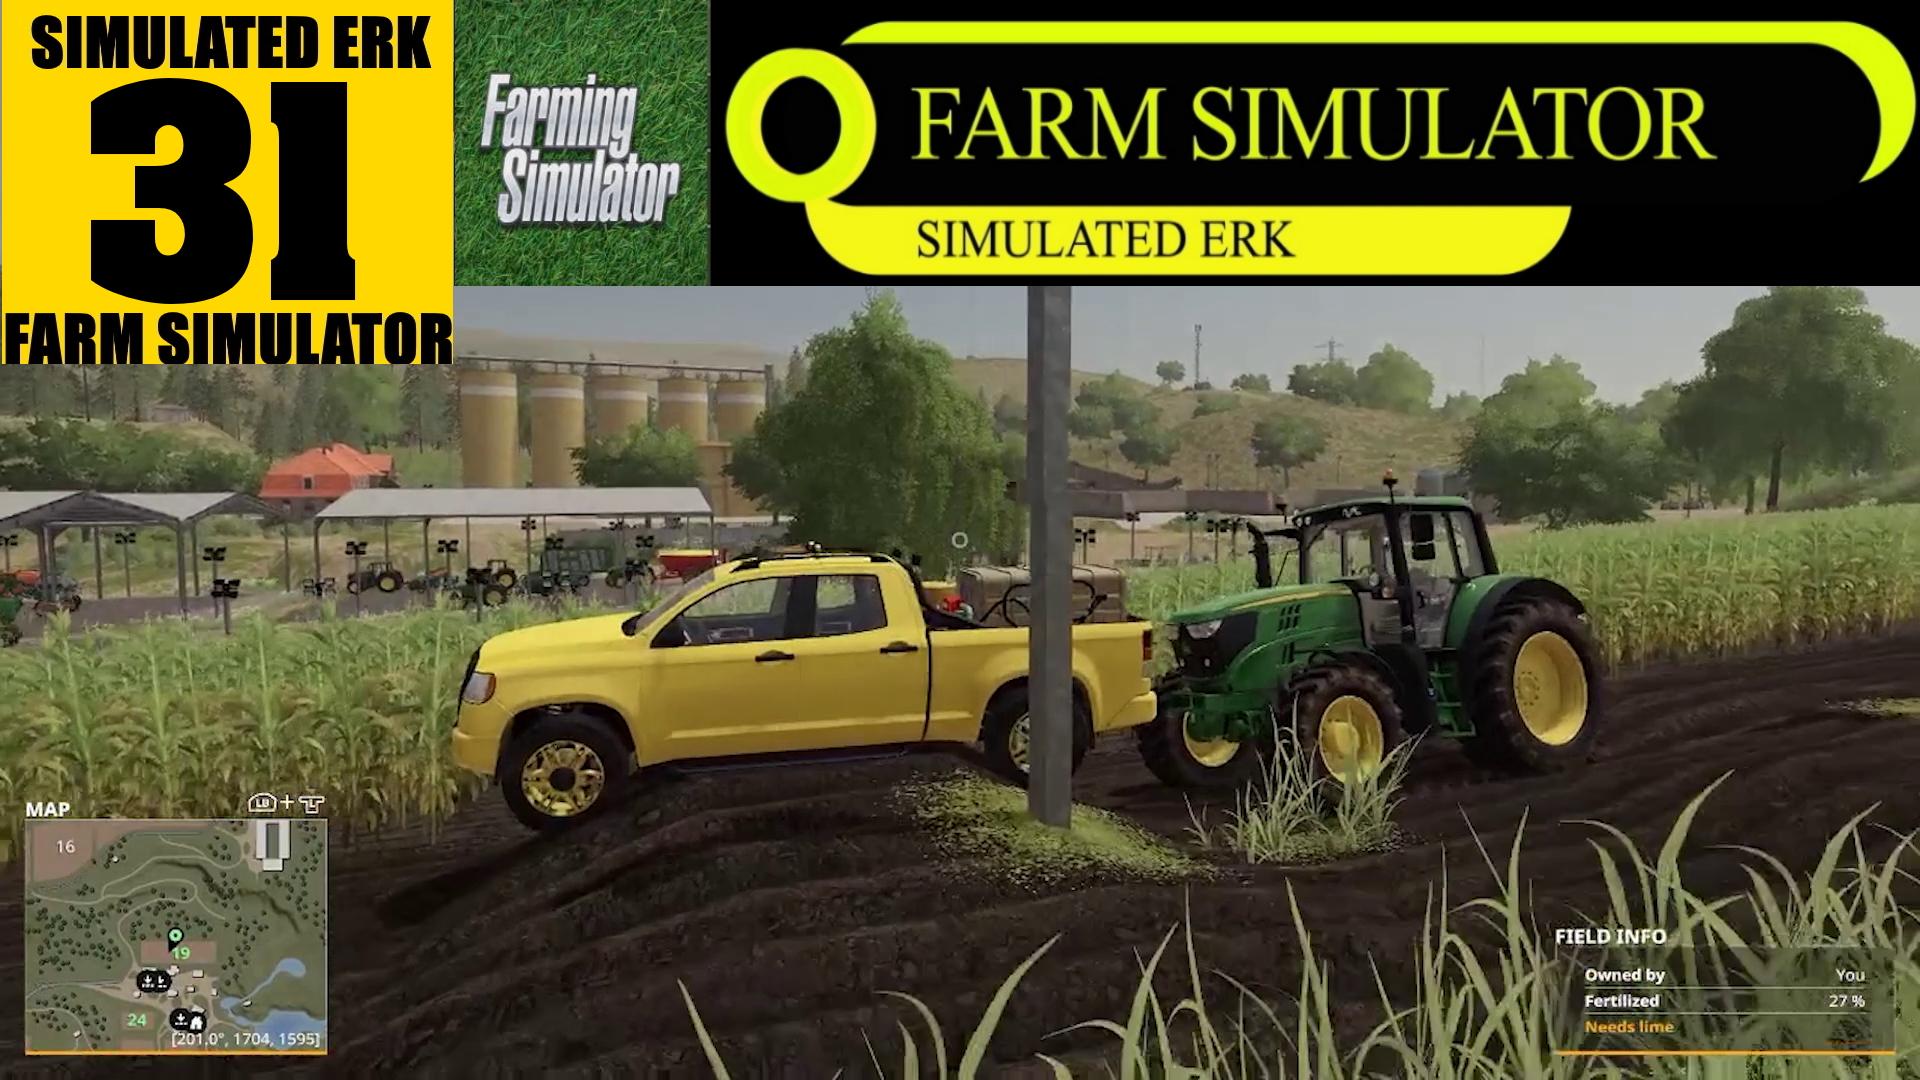 Simulated Erk: Farm Simulator episode 31- Rain Has Stopped Play